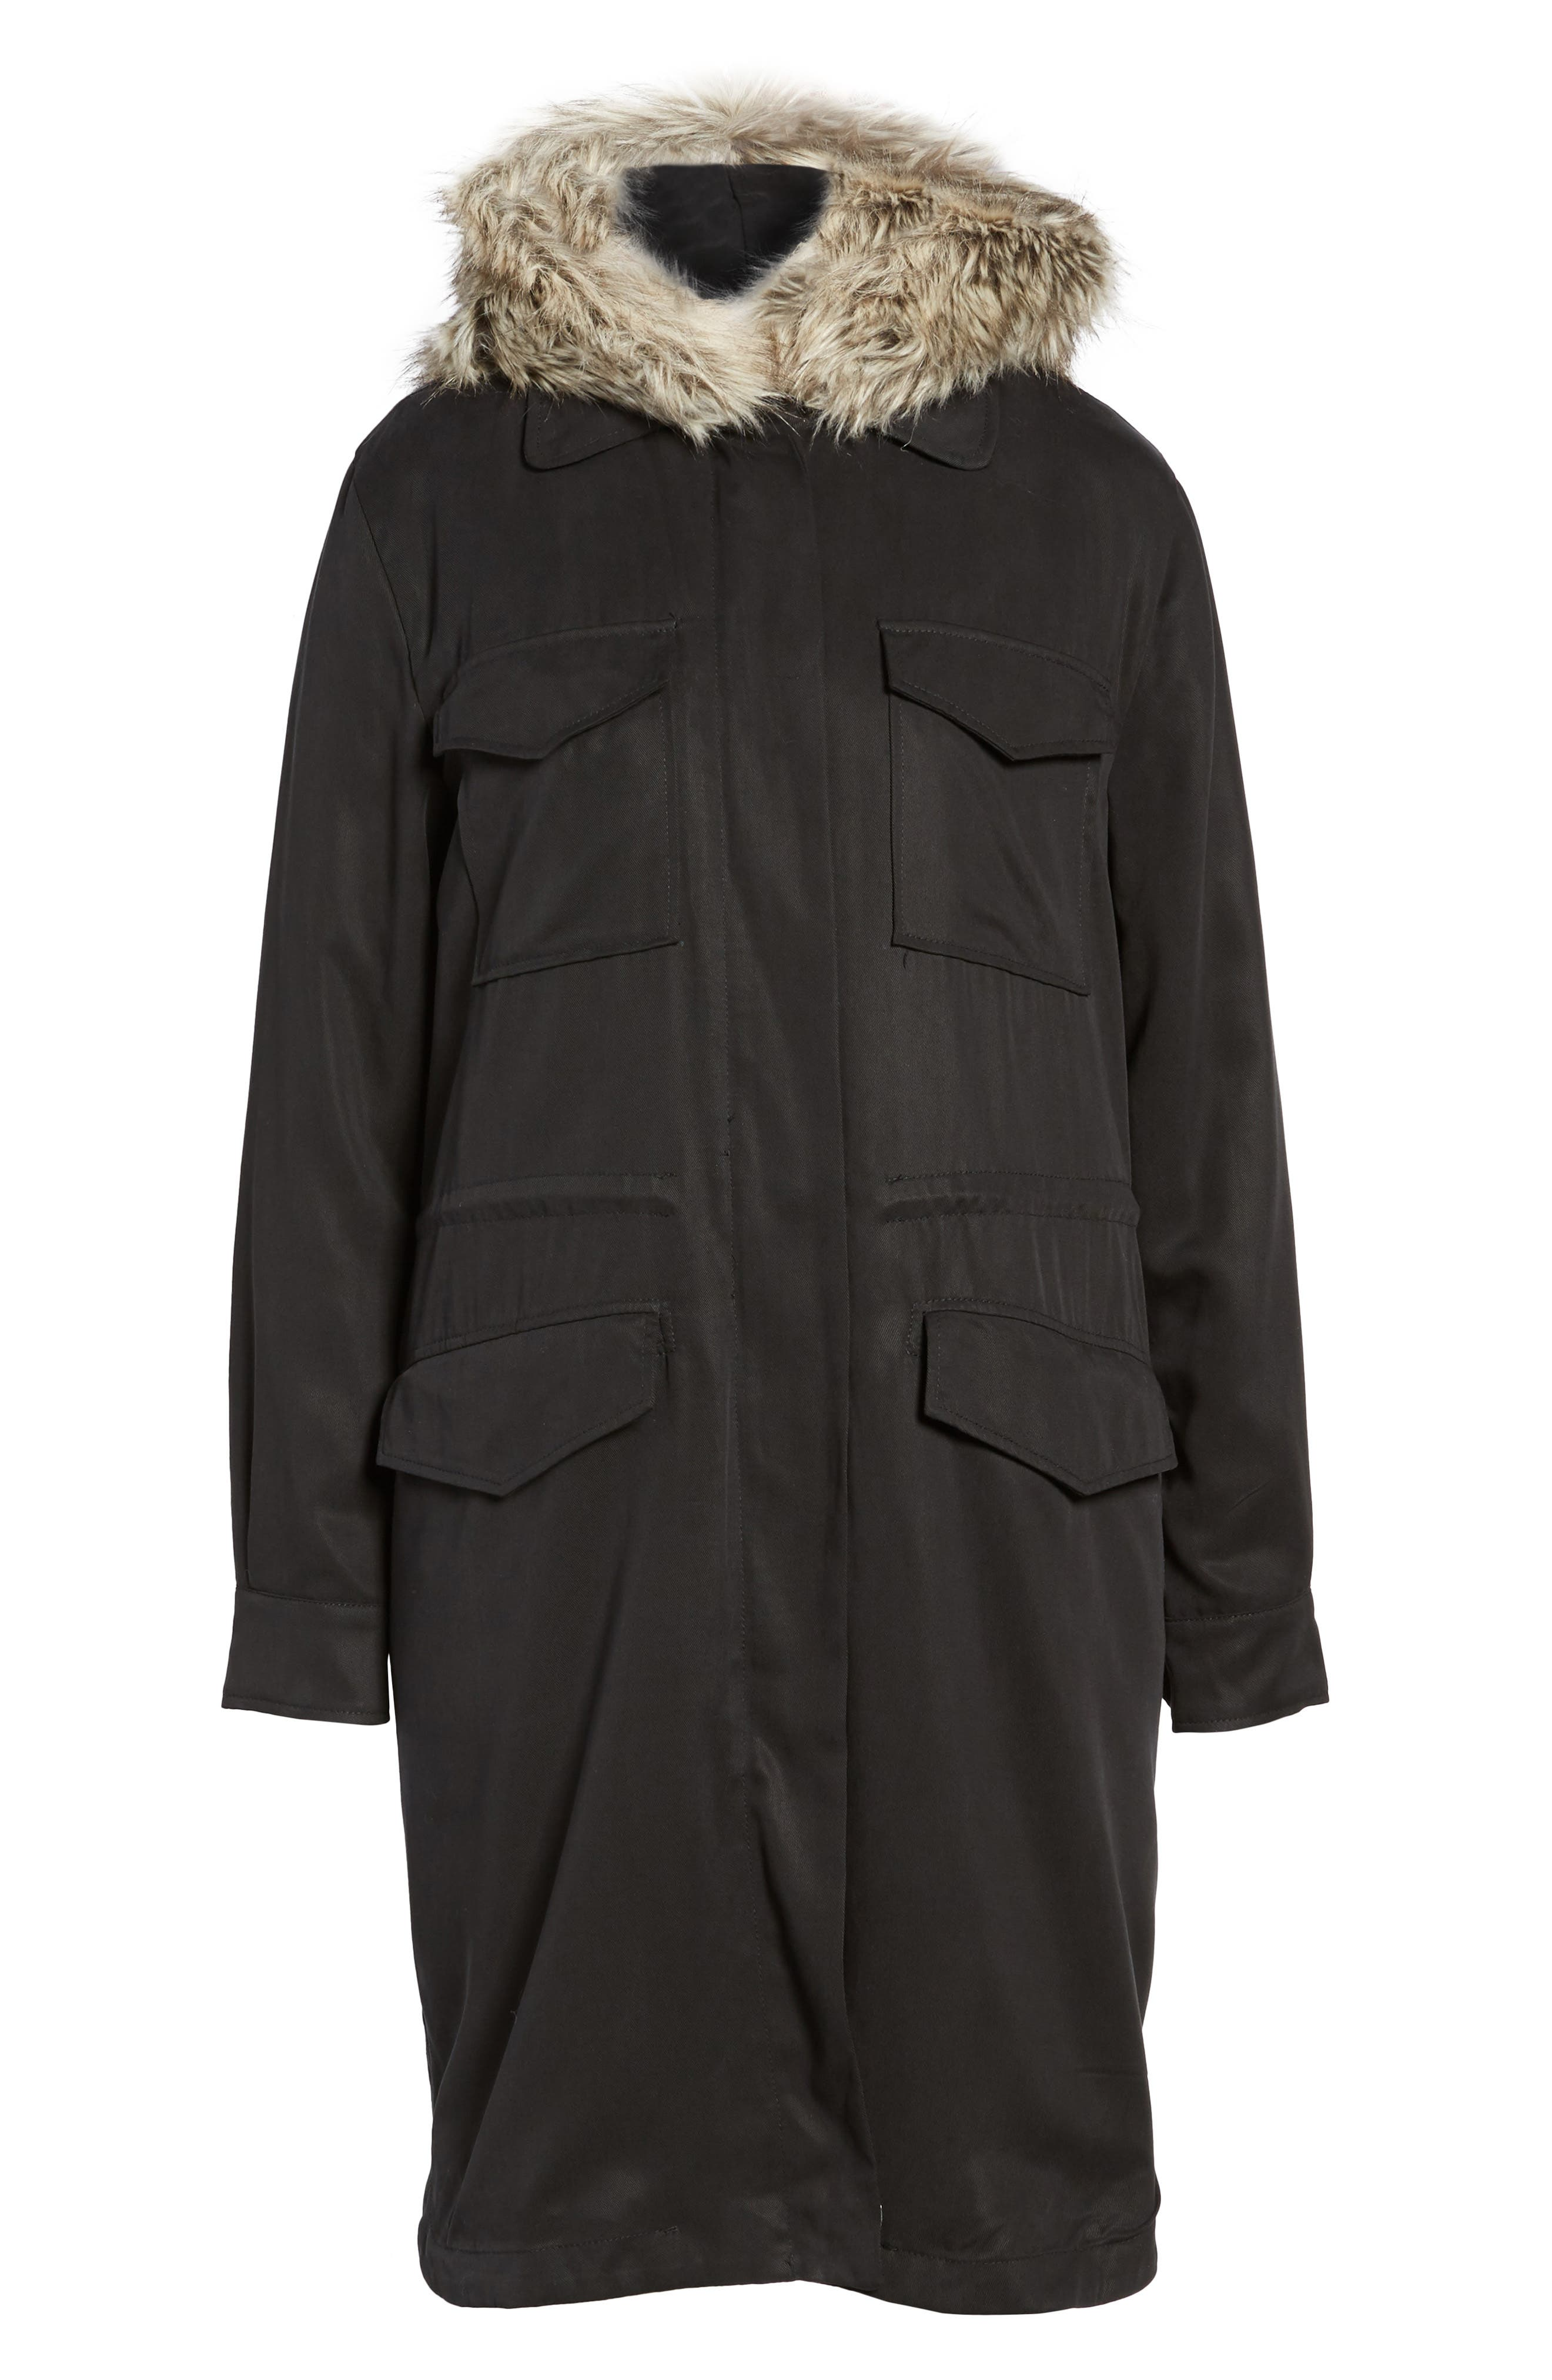 Walsh Tencel<sup>®</sup> Coat with Detachable Hooded Faux Fur Vest,                             Alternate thumbnail 5, color,                             001